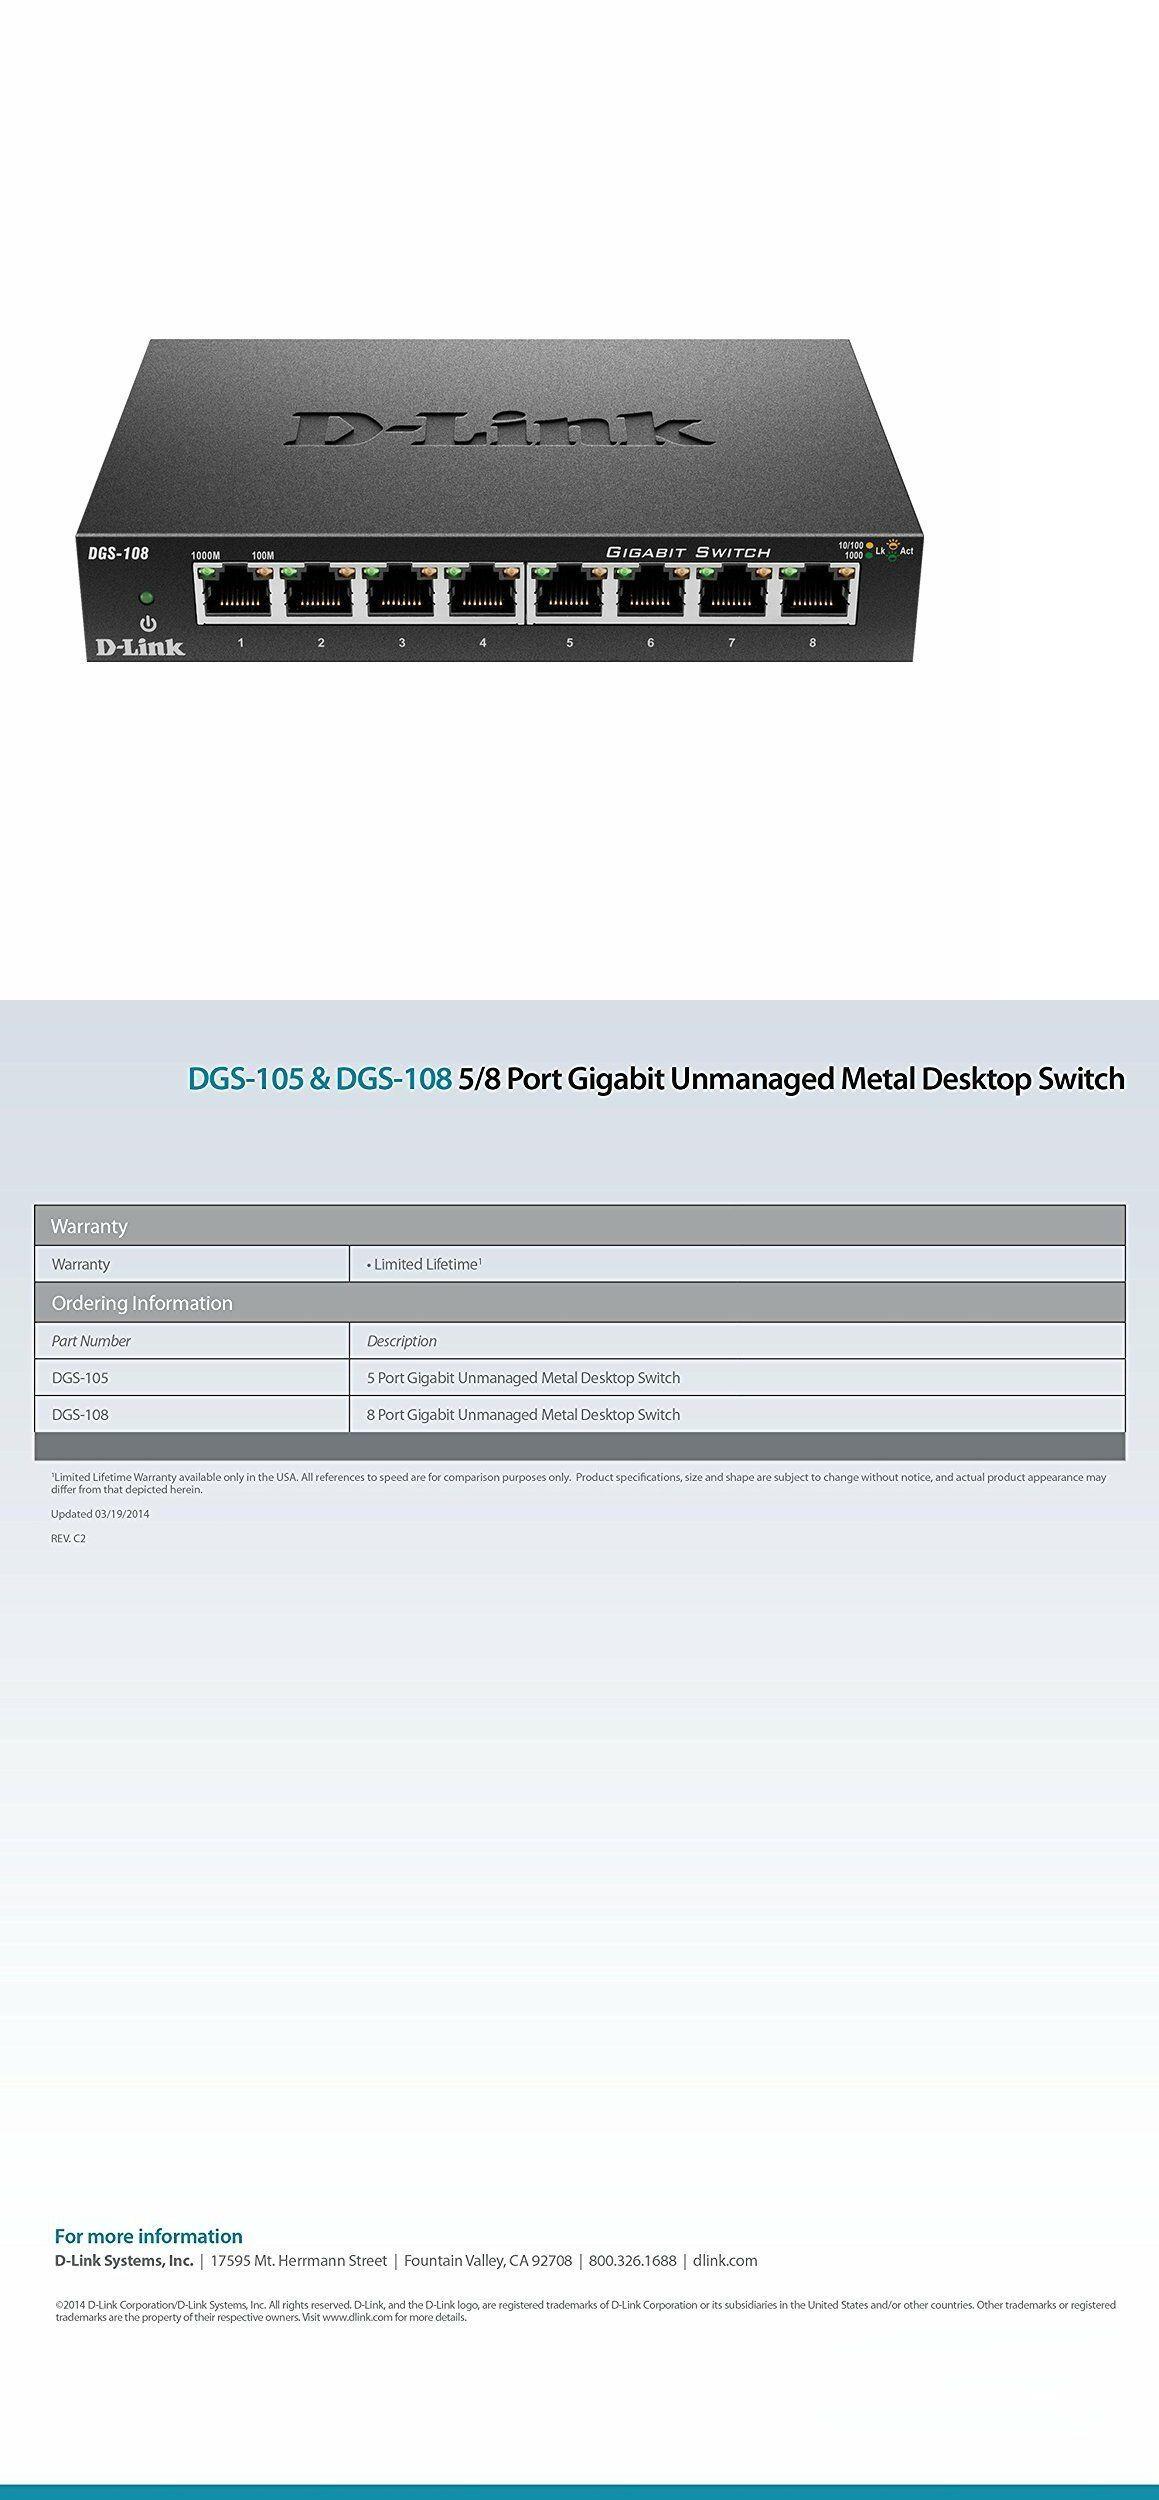 DGS-108 D-Link 8 Port Gigabit Unmanaged Metal Desktop Switch